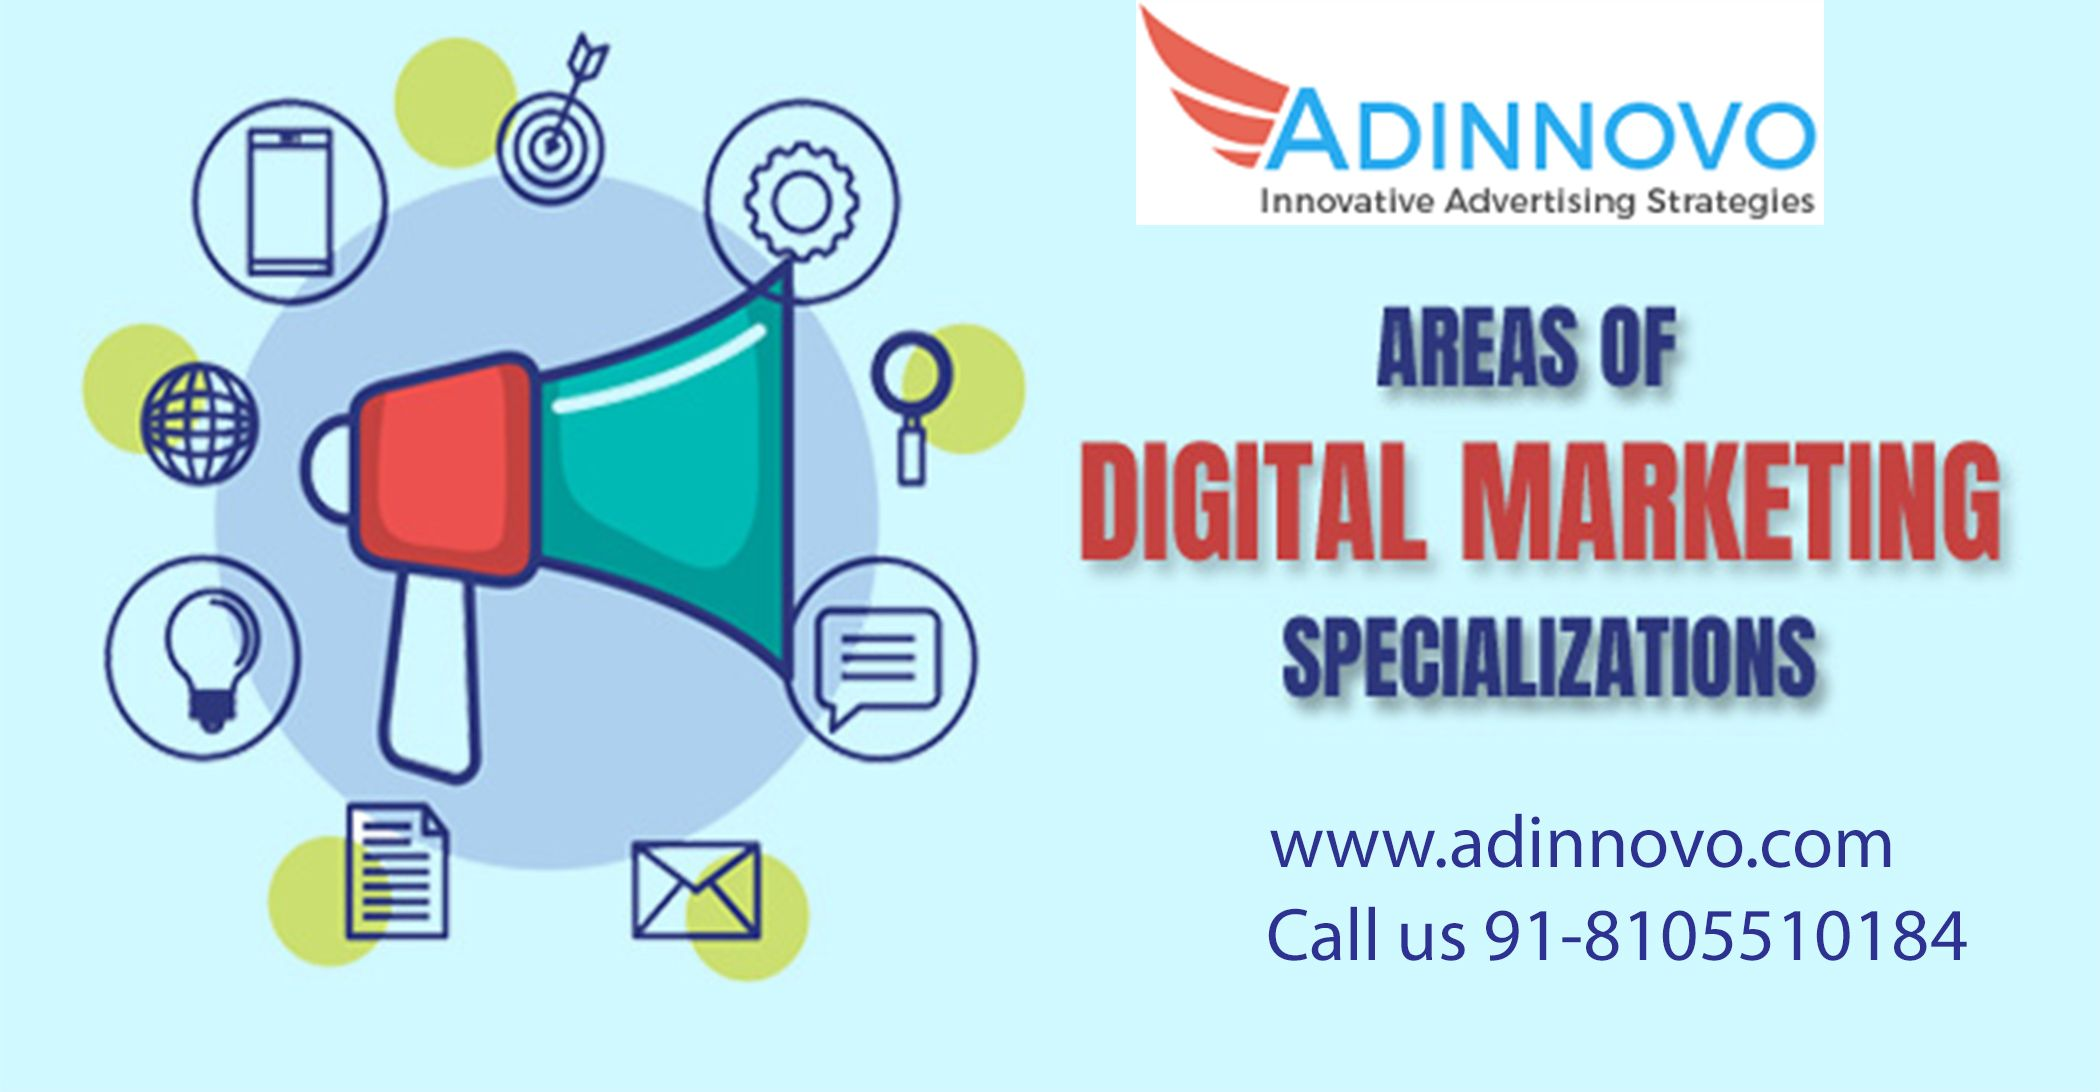 Adinnovo is innovative and the best branded Digital